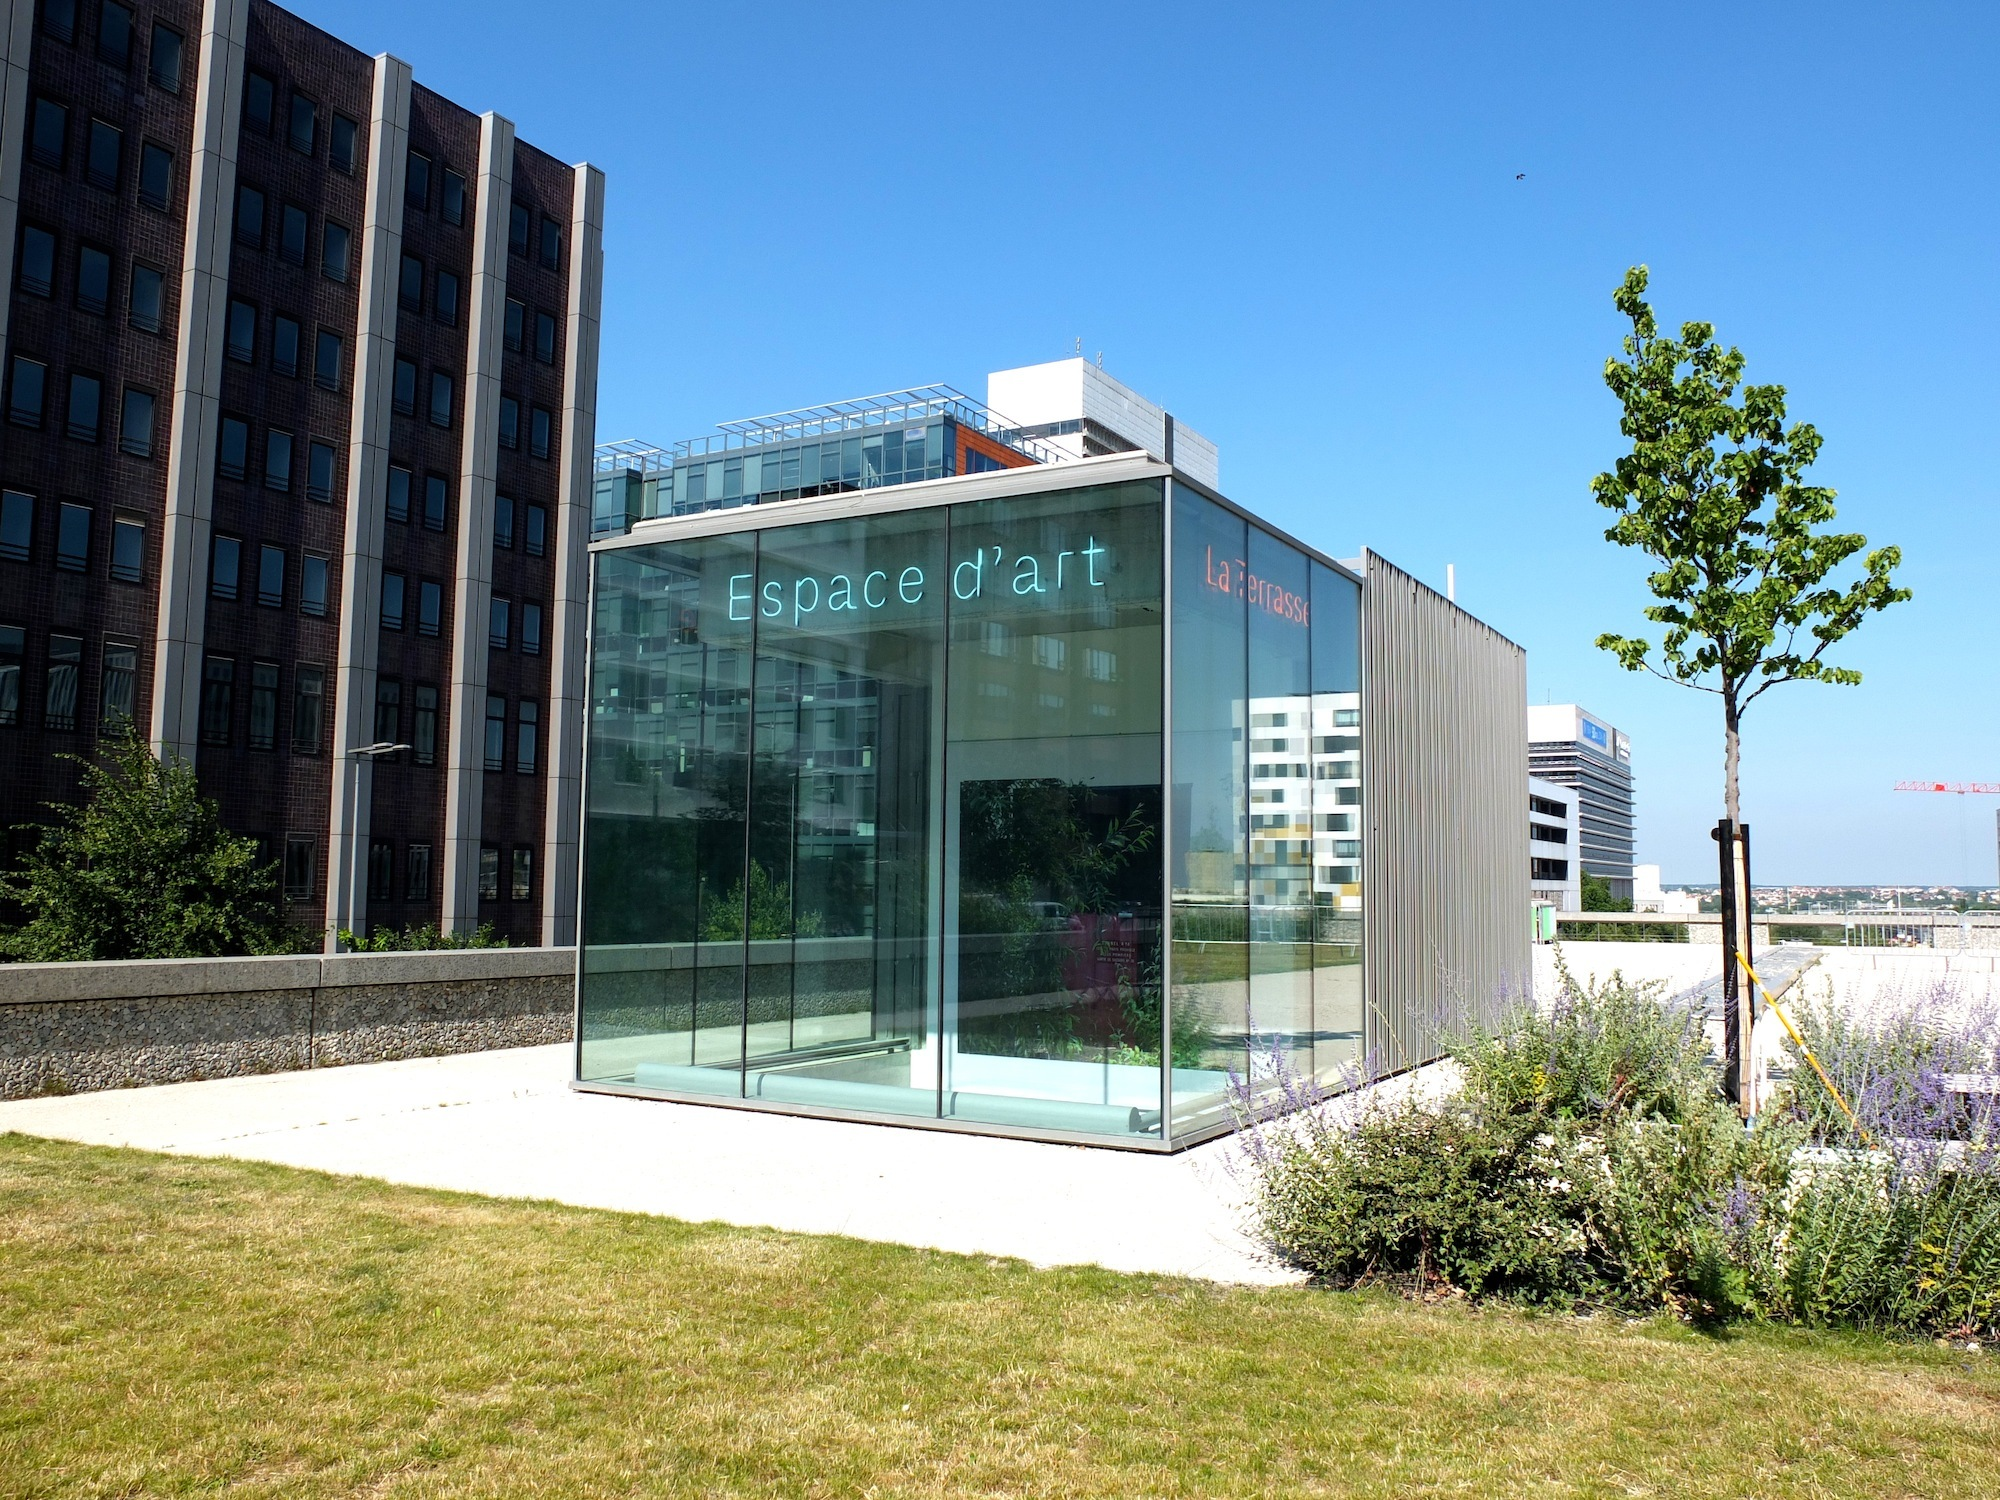 La Terrasse de Nanterre - Espace d'art